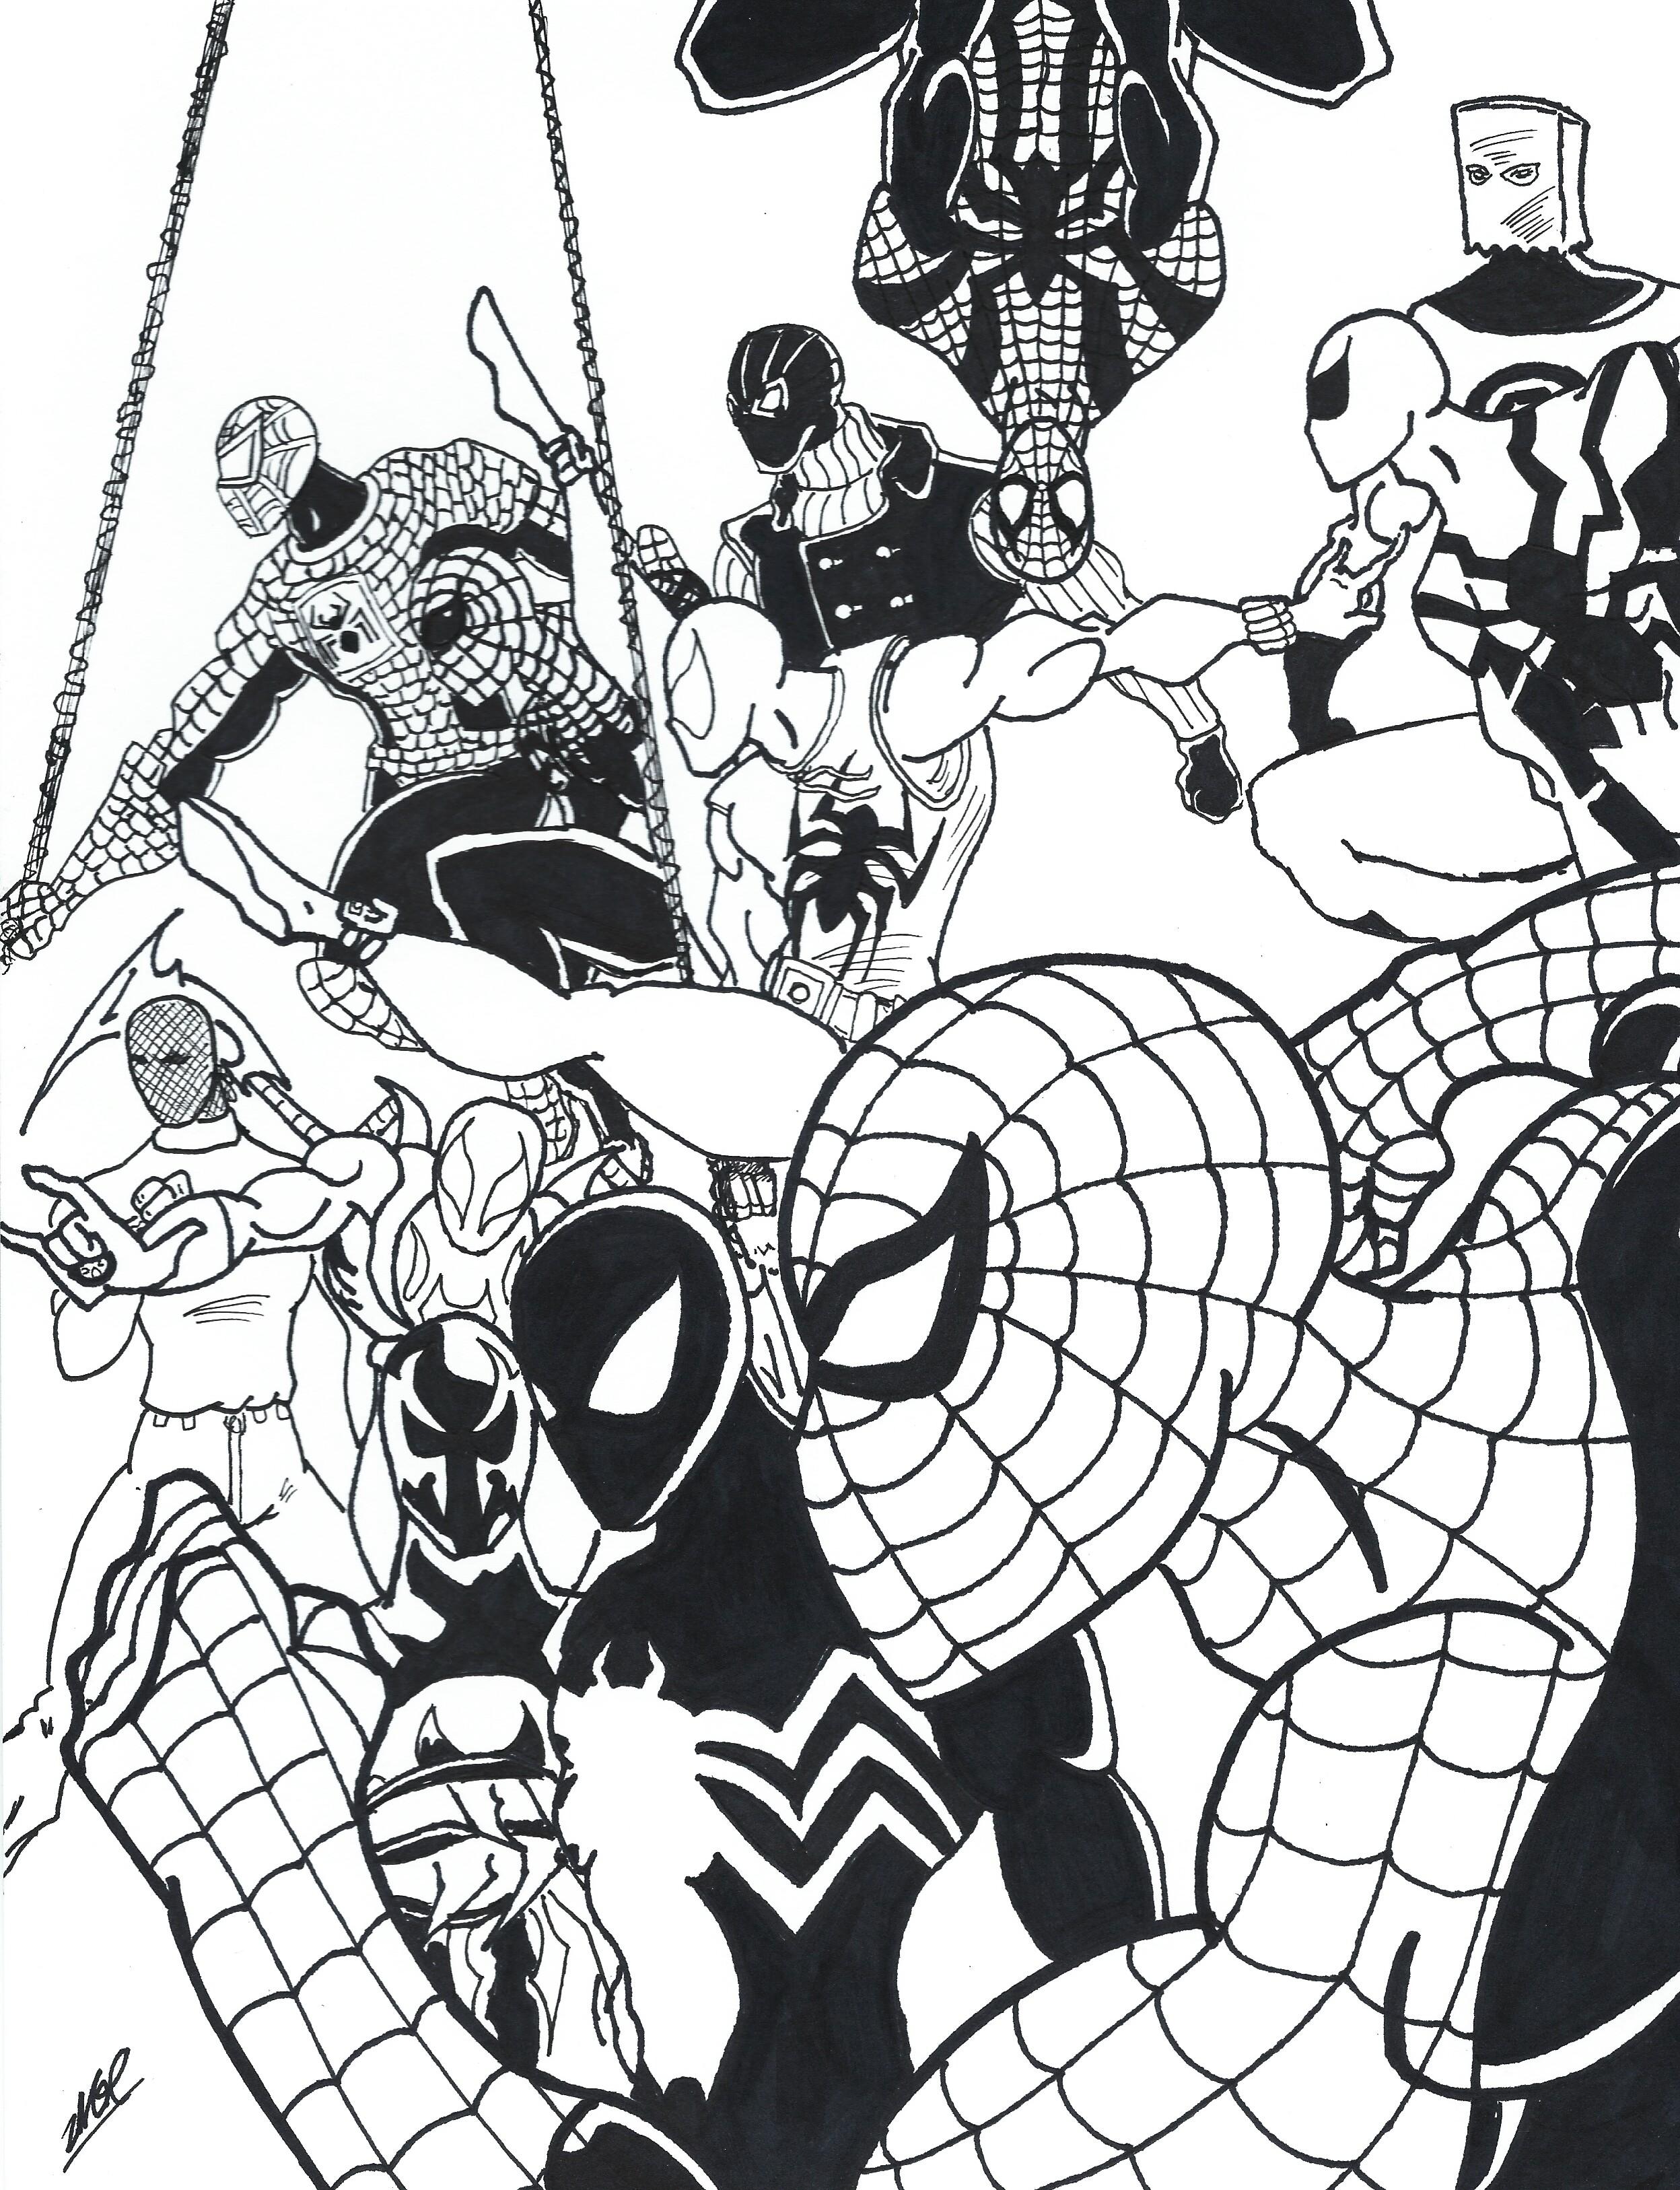 Legends of Spider-man